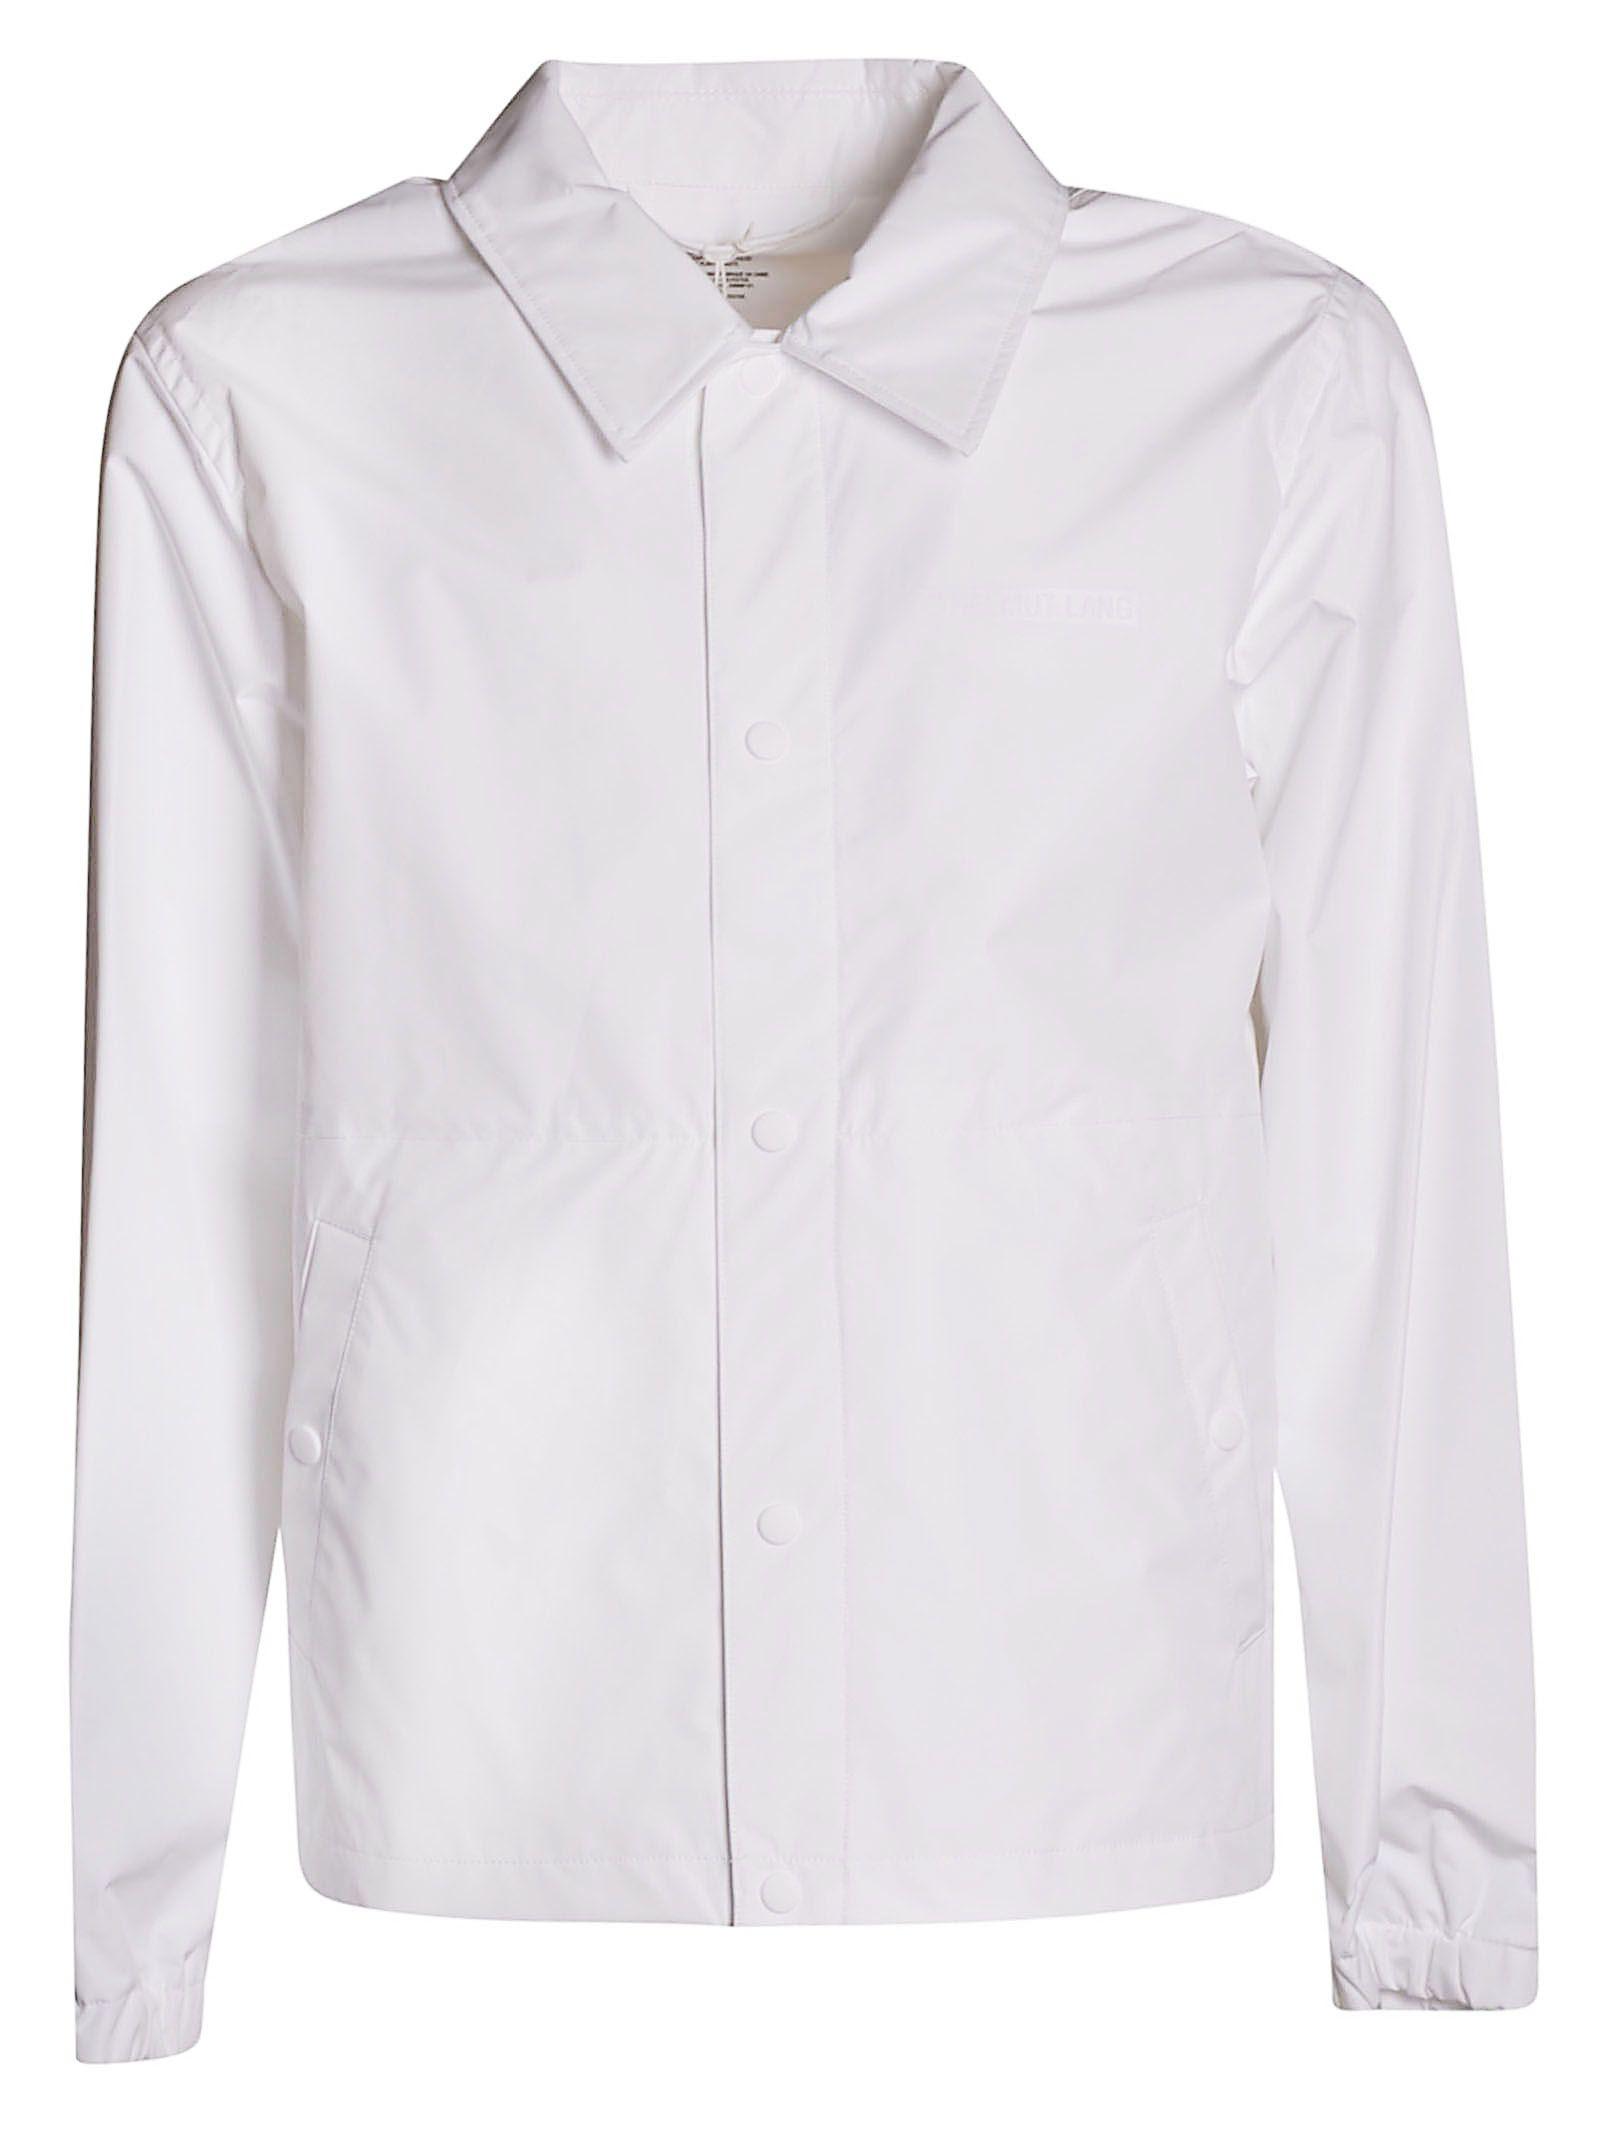 Helmut Lang Stadium Shirt Jacket